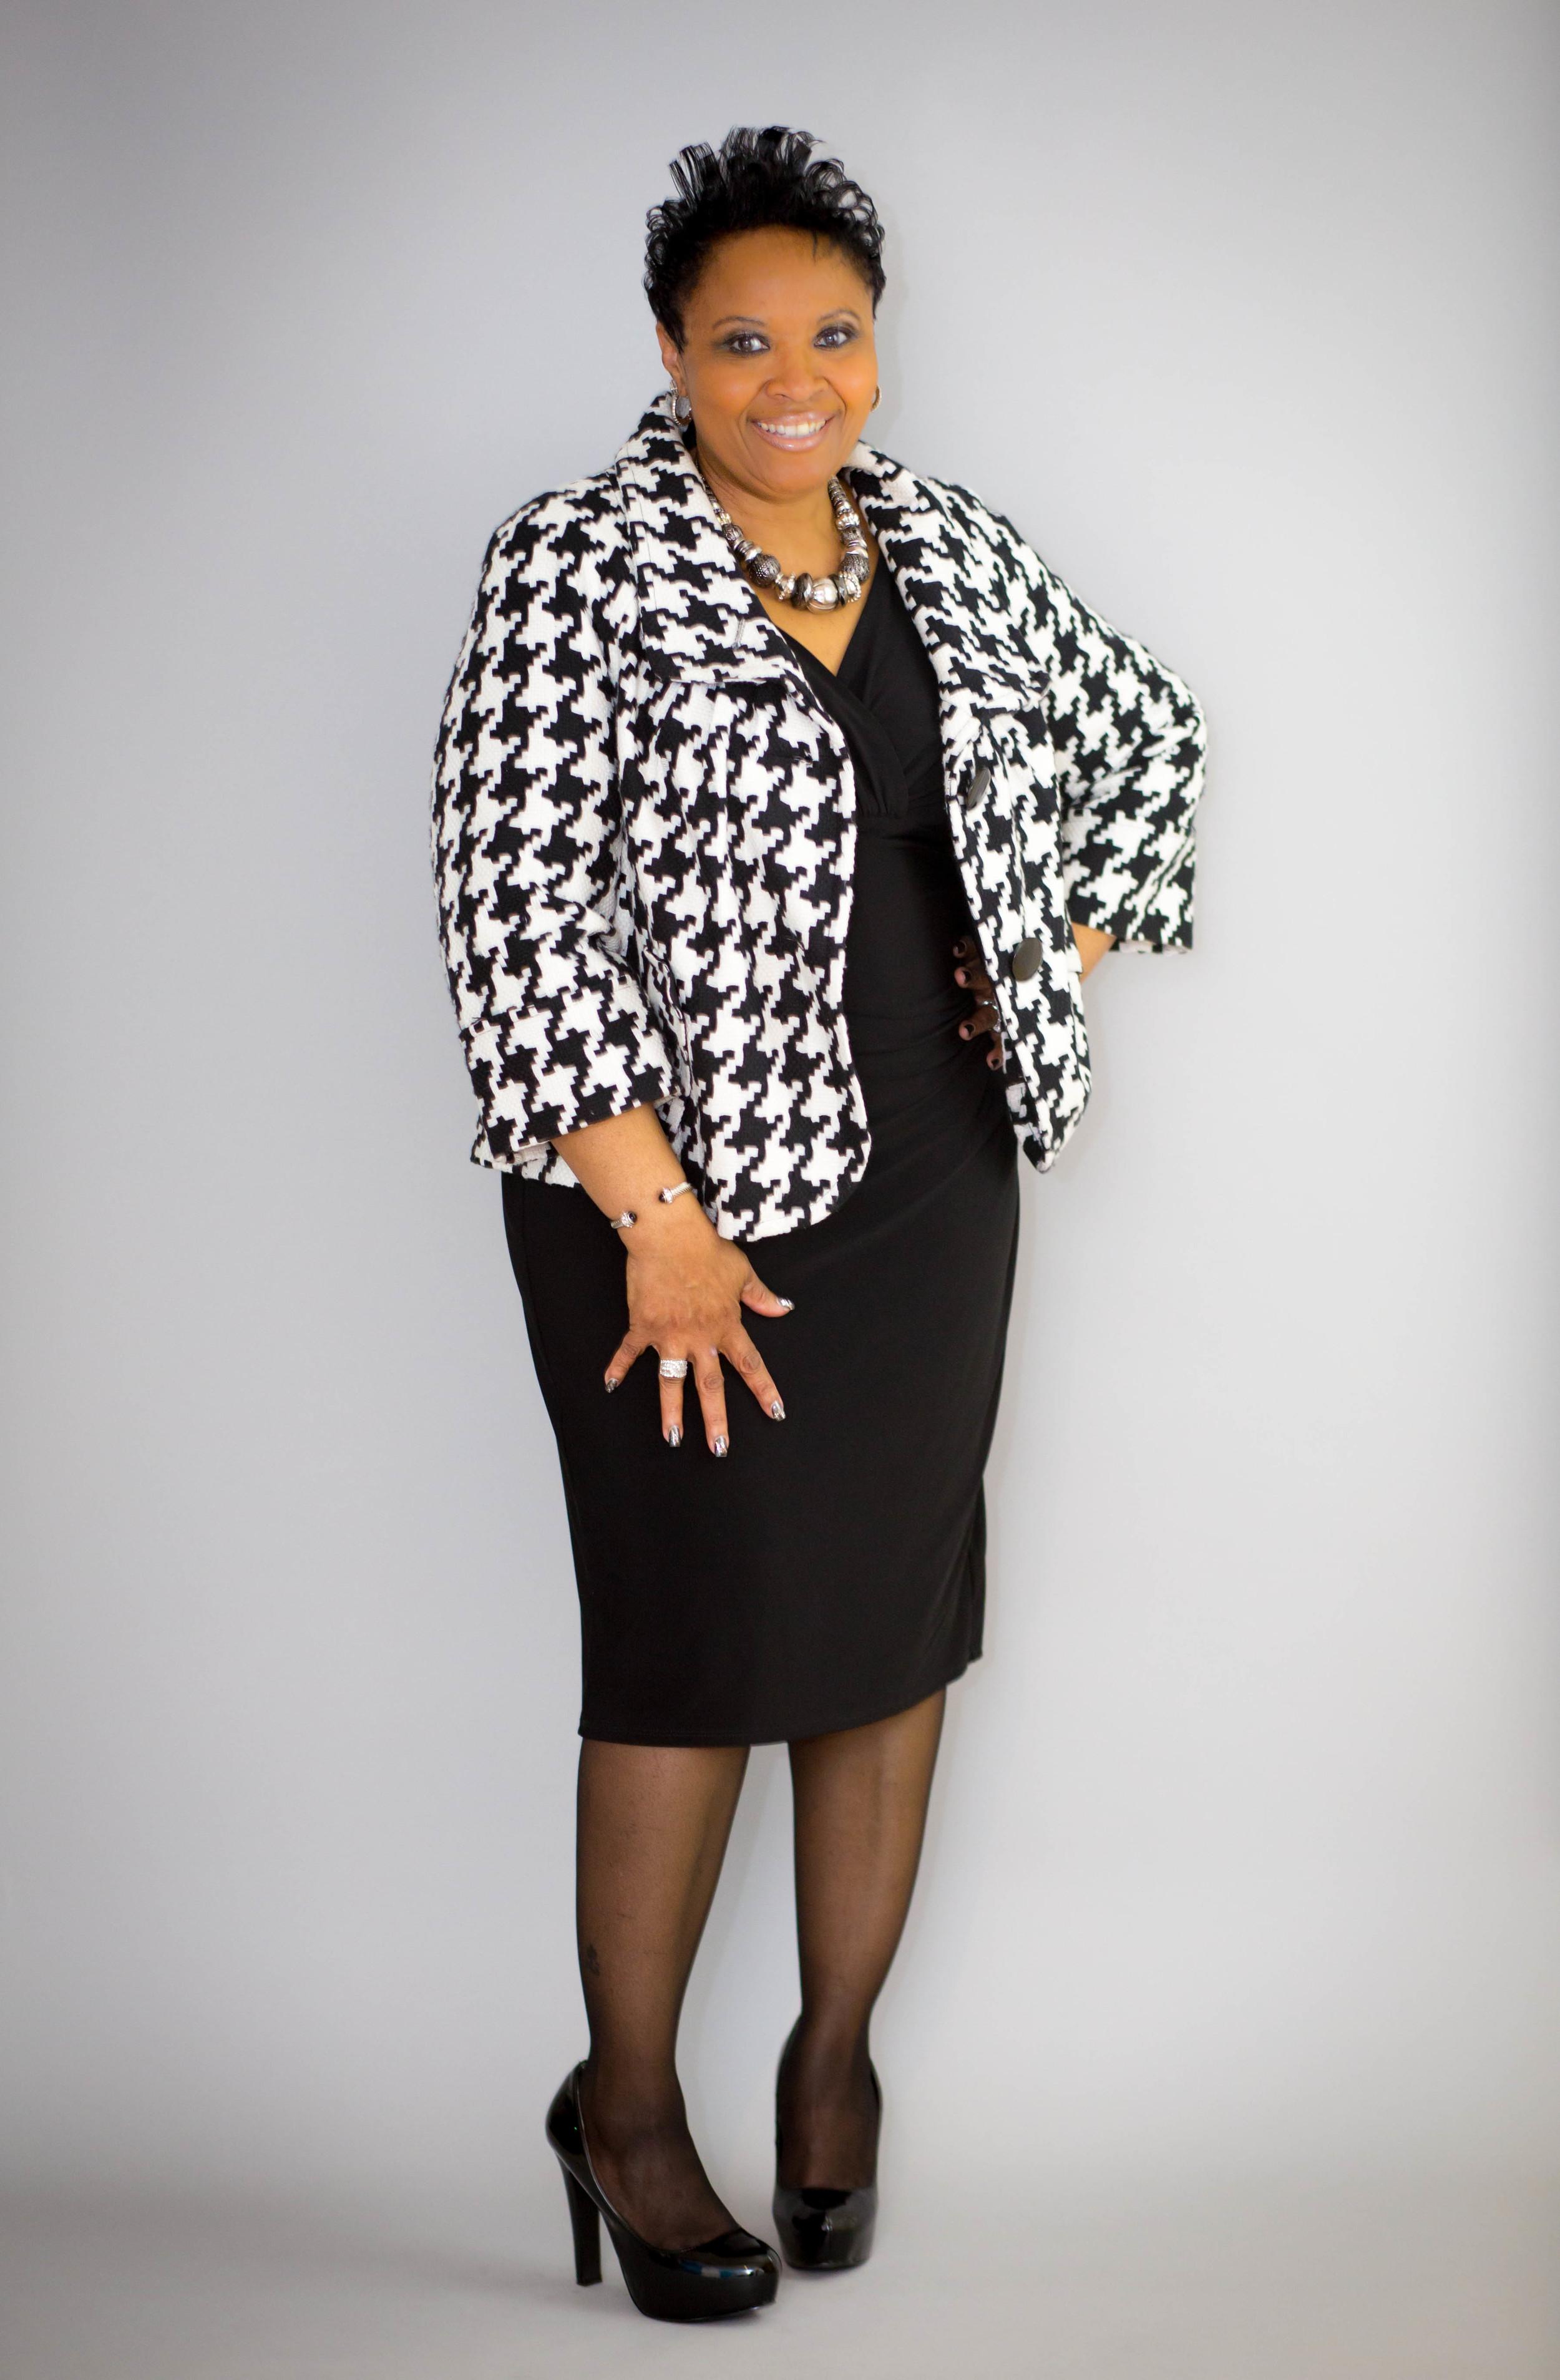 Follow Phyllis Trafton's  Overcomer's Daily Lift